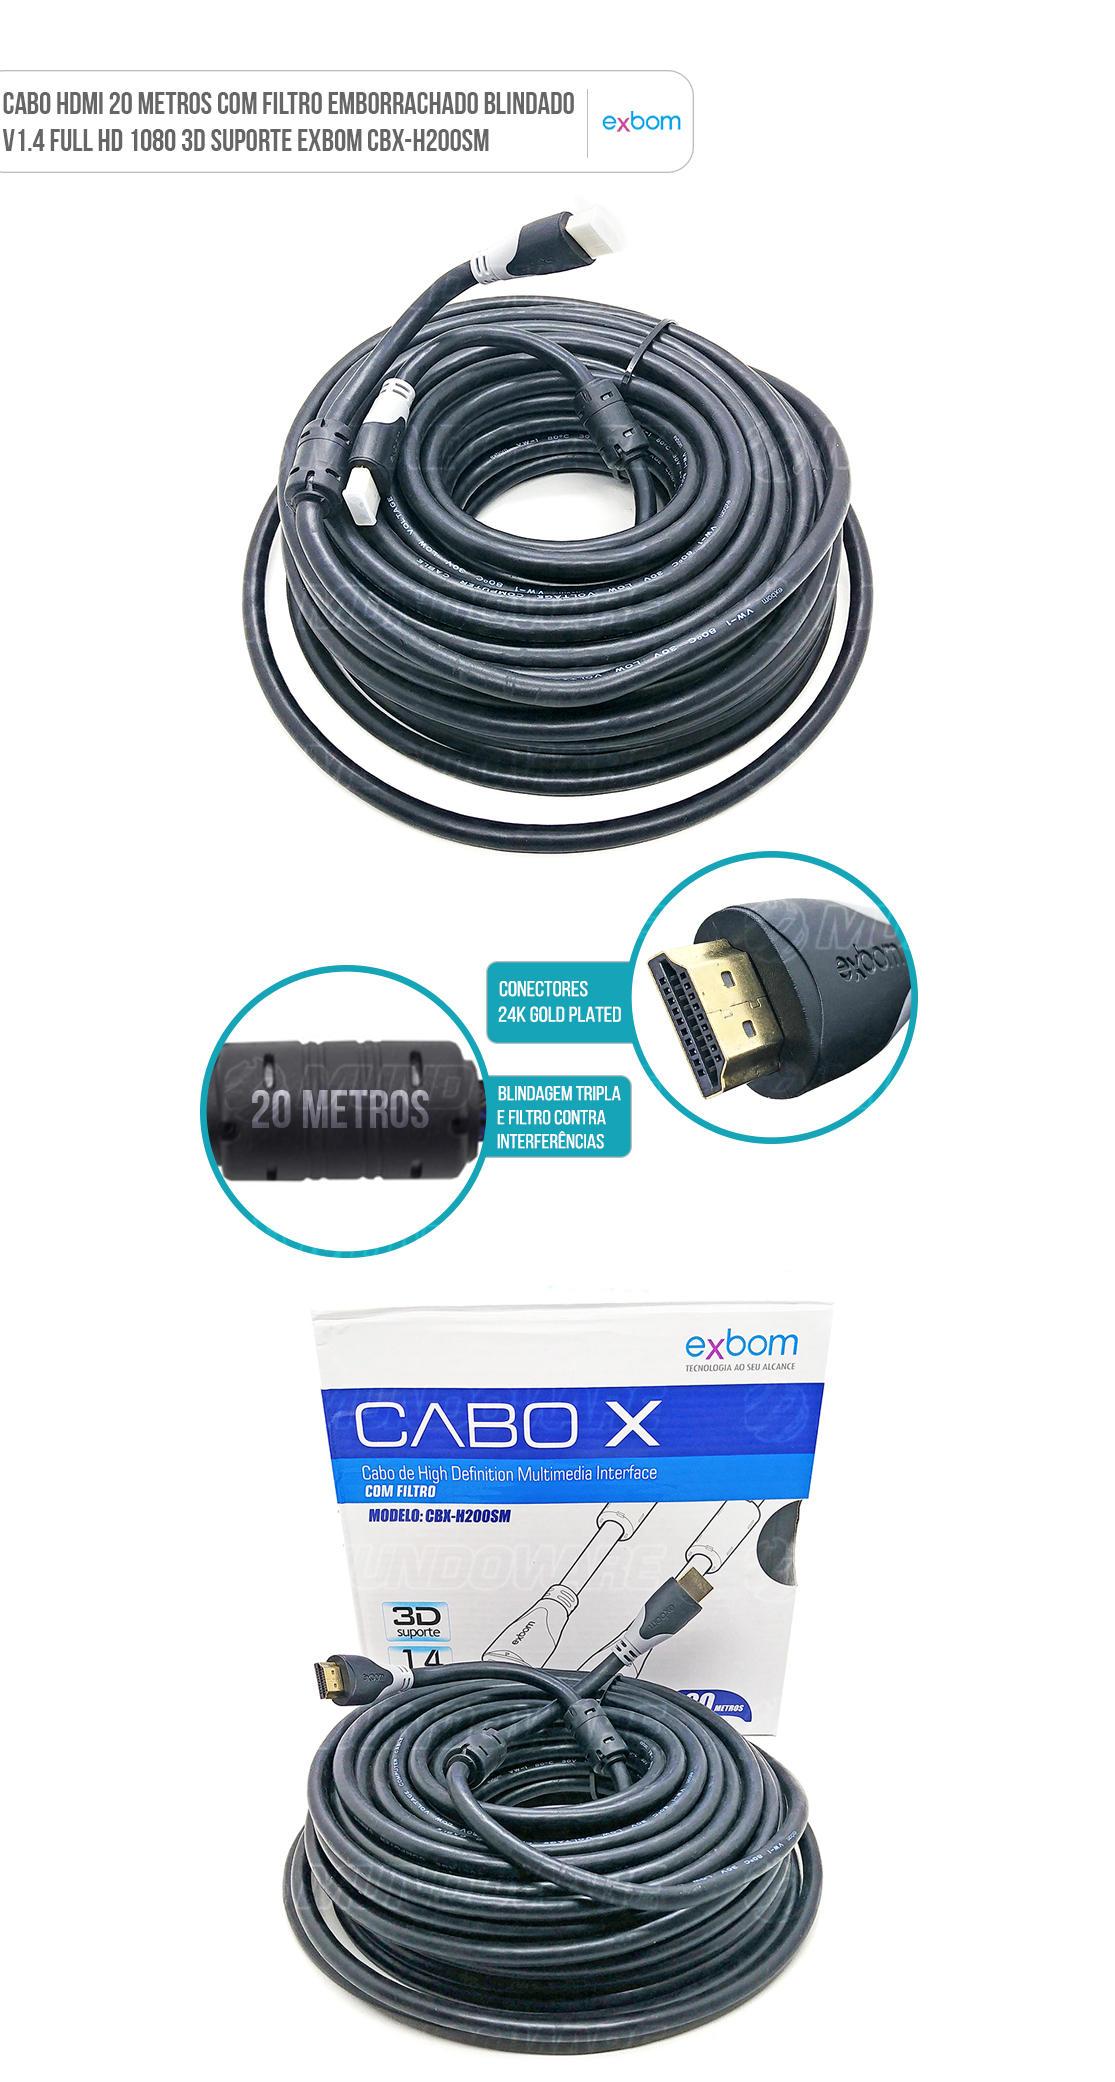 Cabo HDMI MachoxMacho 20 metros com Filtro Emborrachado Blindado v1.4 Full HD 1080 3D